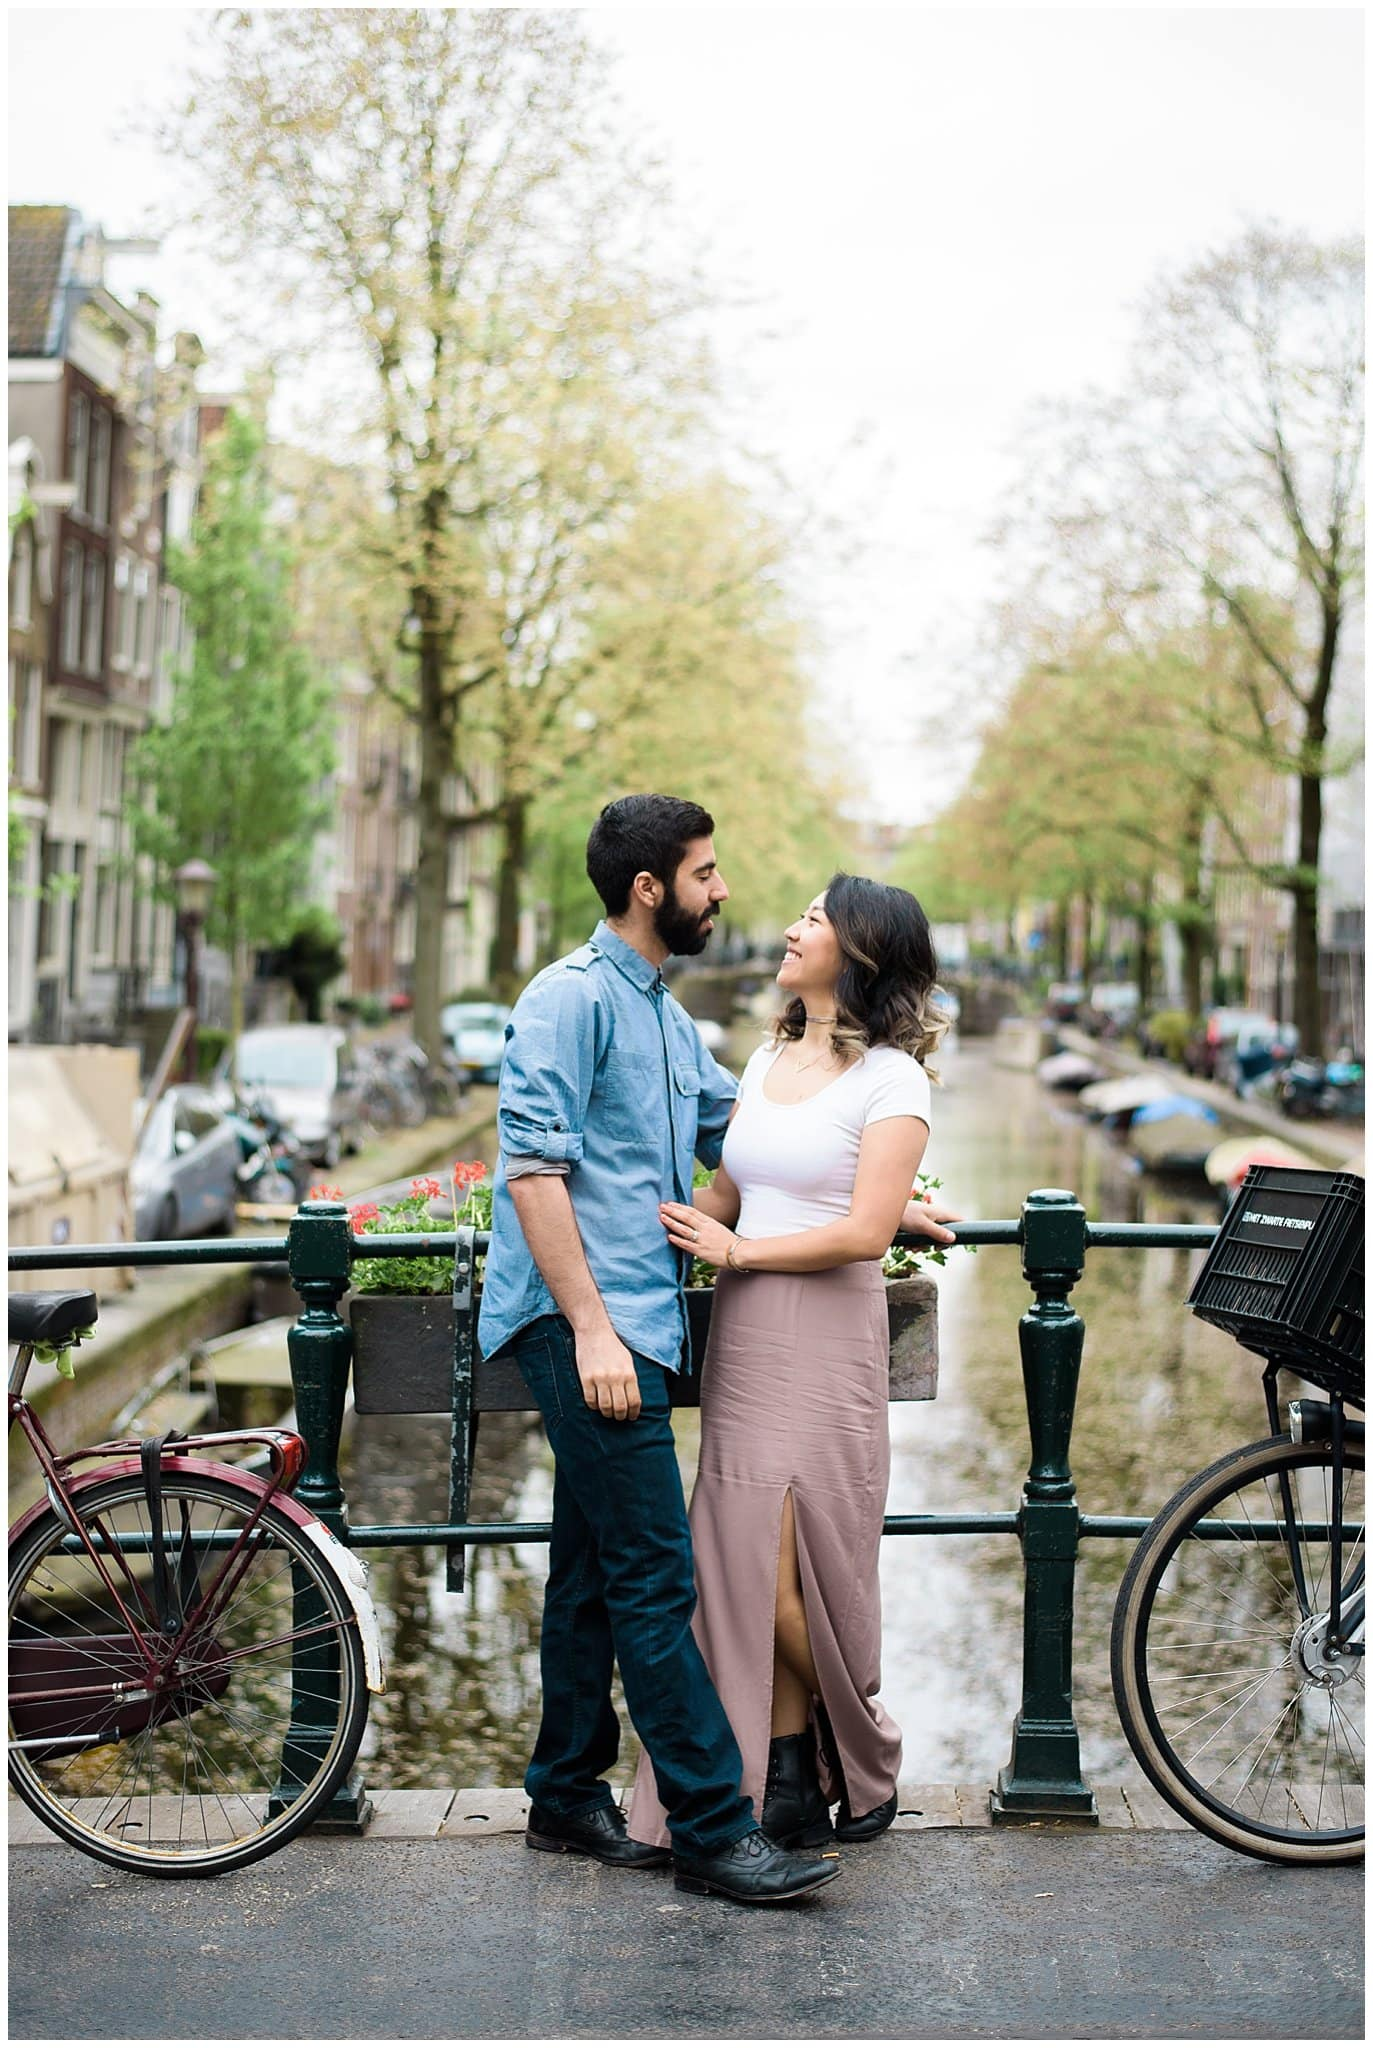 Amsterdam Couple's Session photo